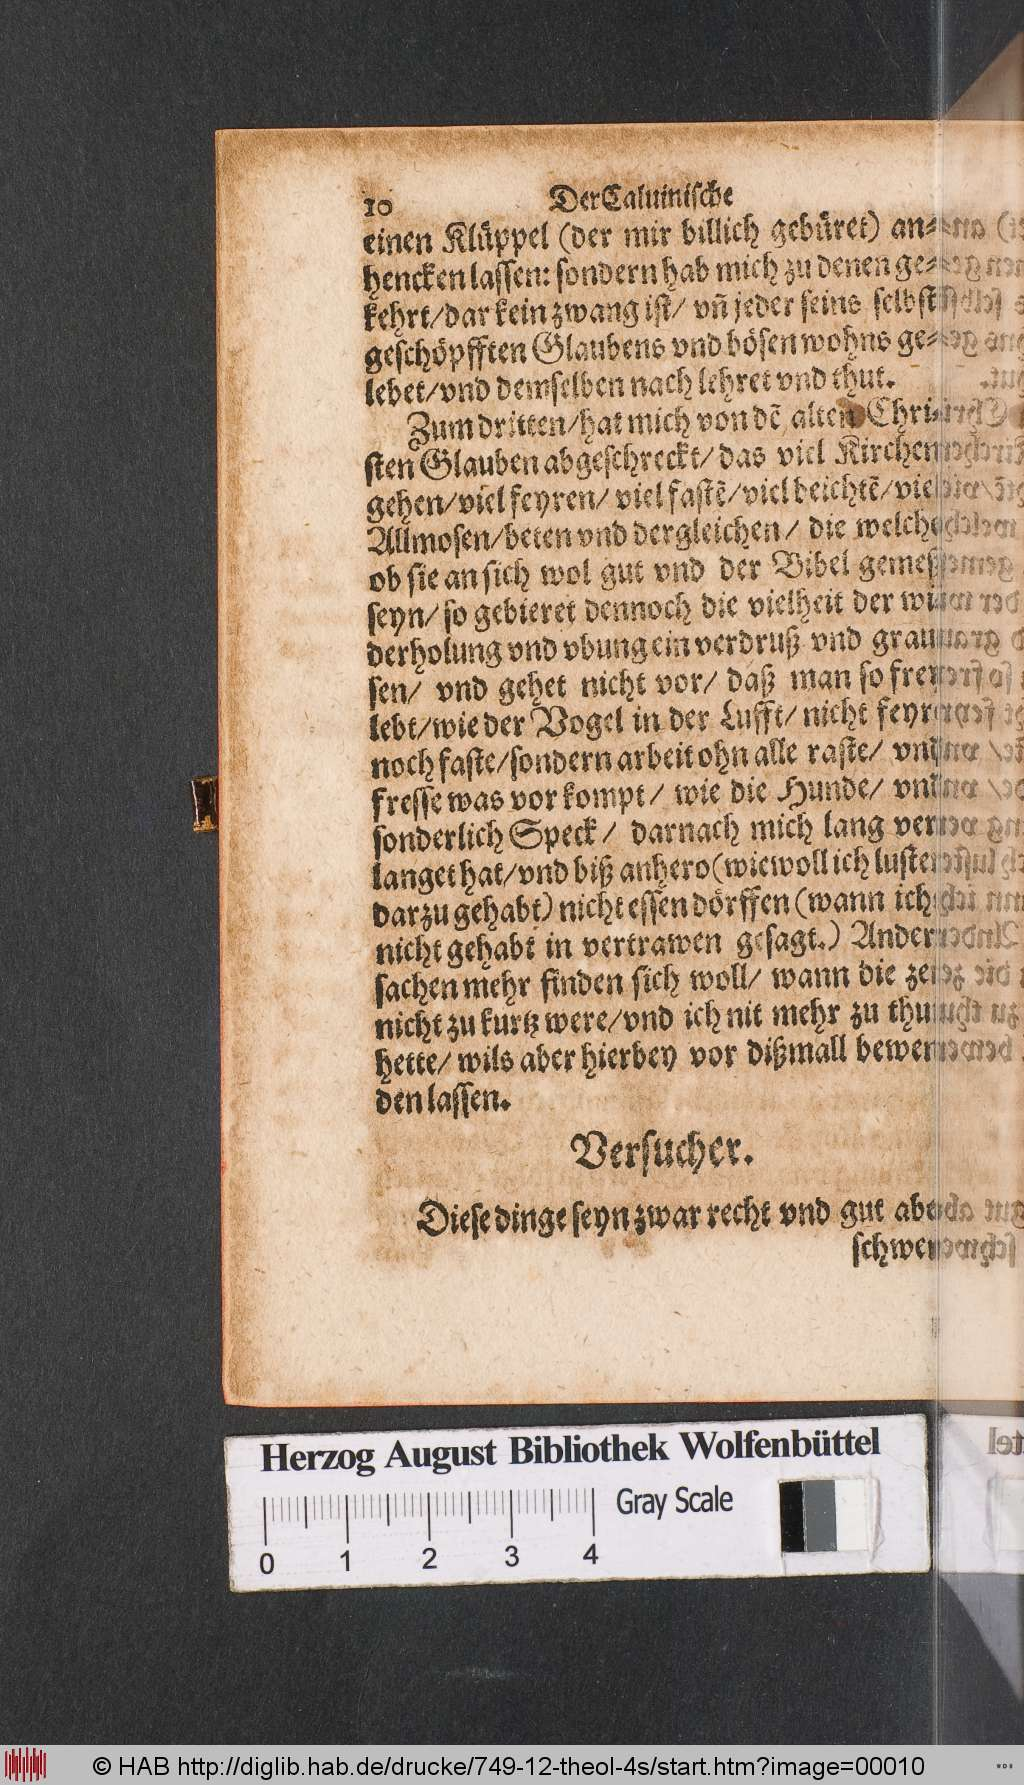 http://diglib.hab.de/drucke/749-12-theol-4s/00010.jpg